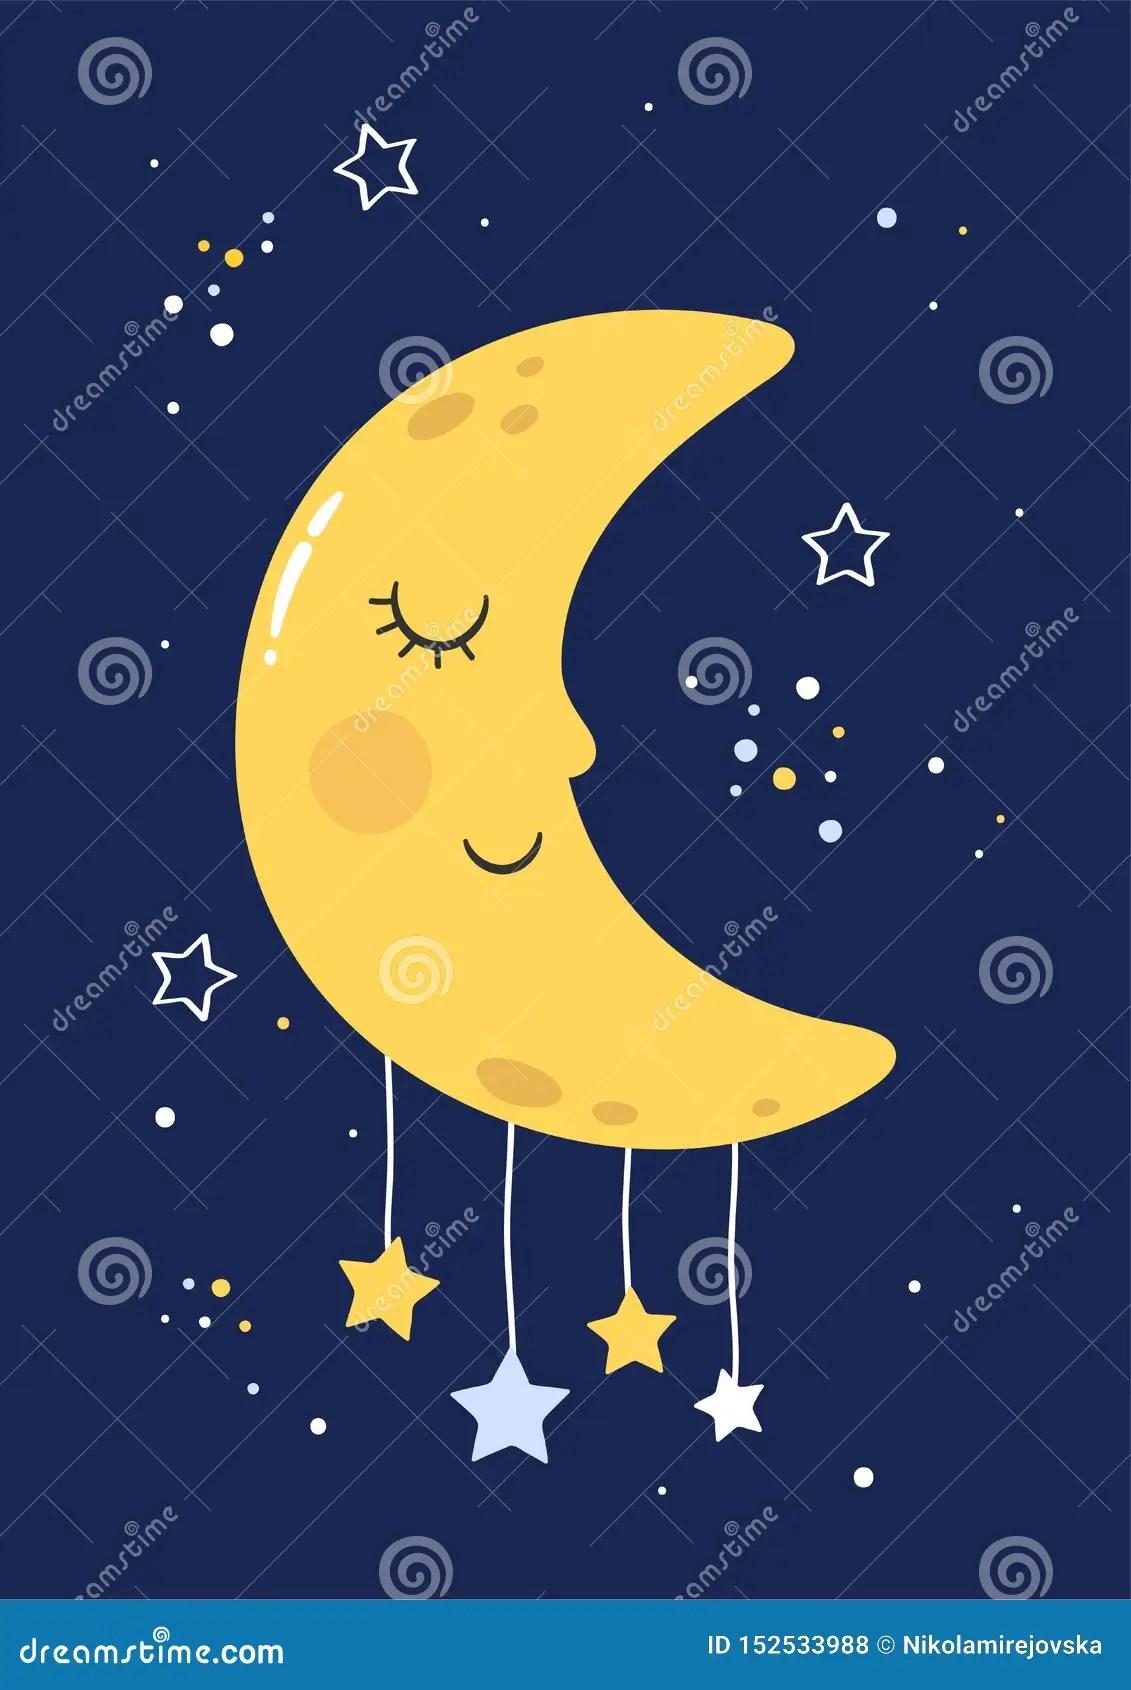 Kids At Night With Moon Cartoon Vector